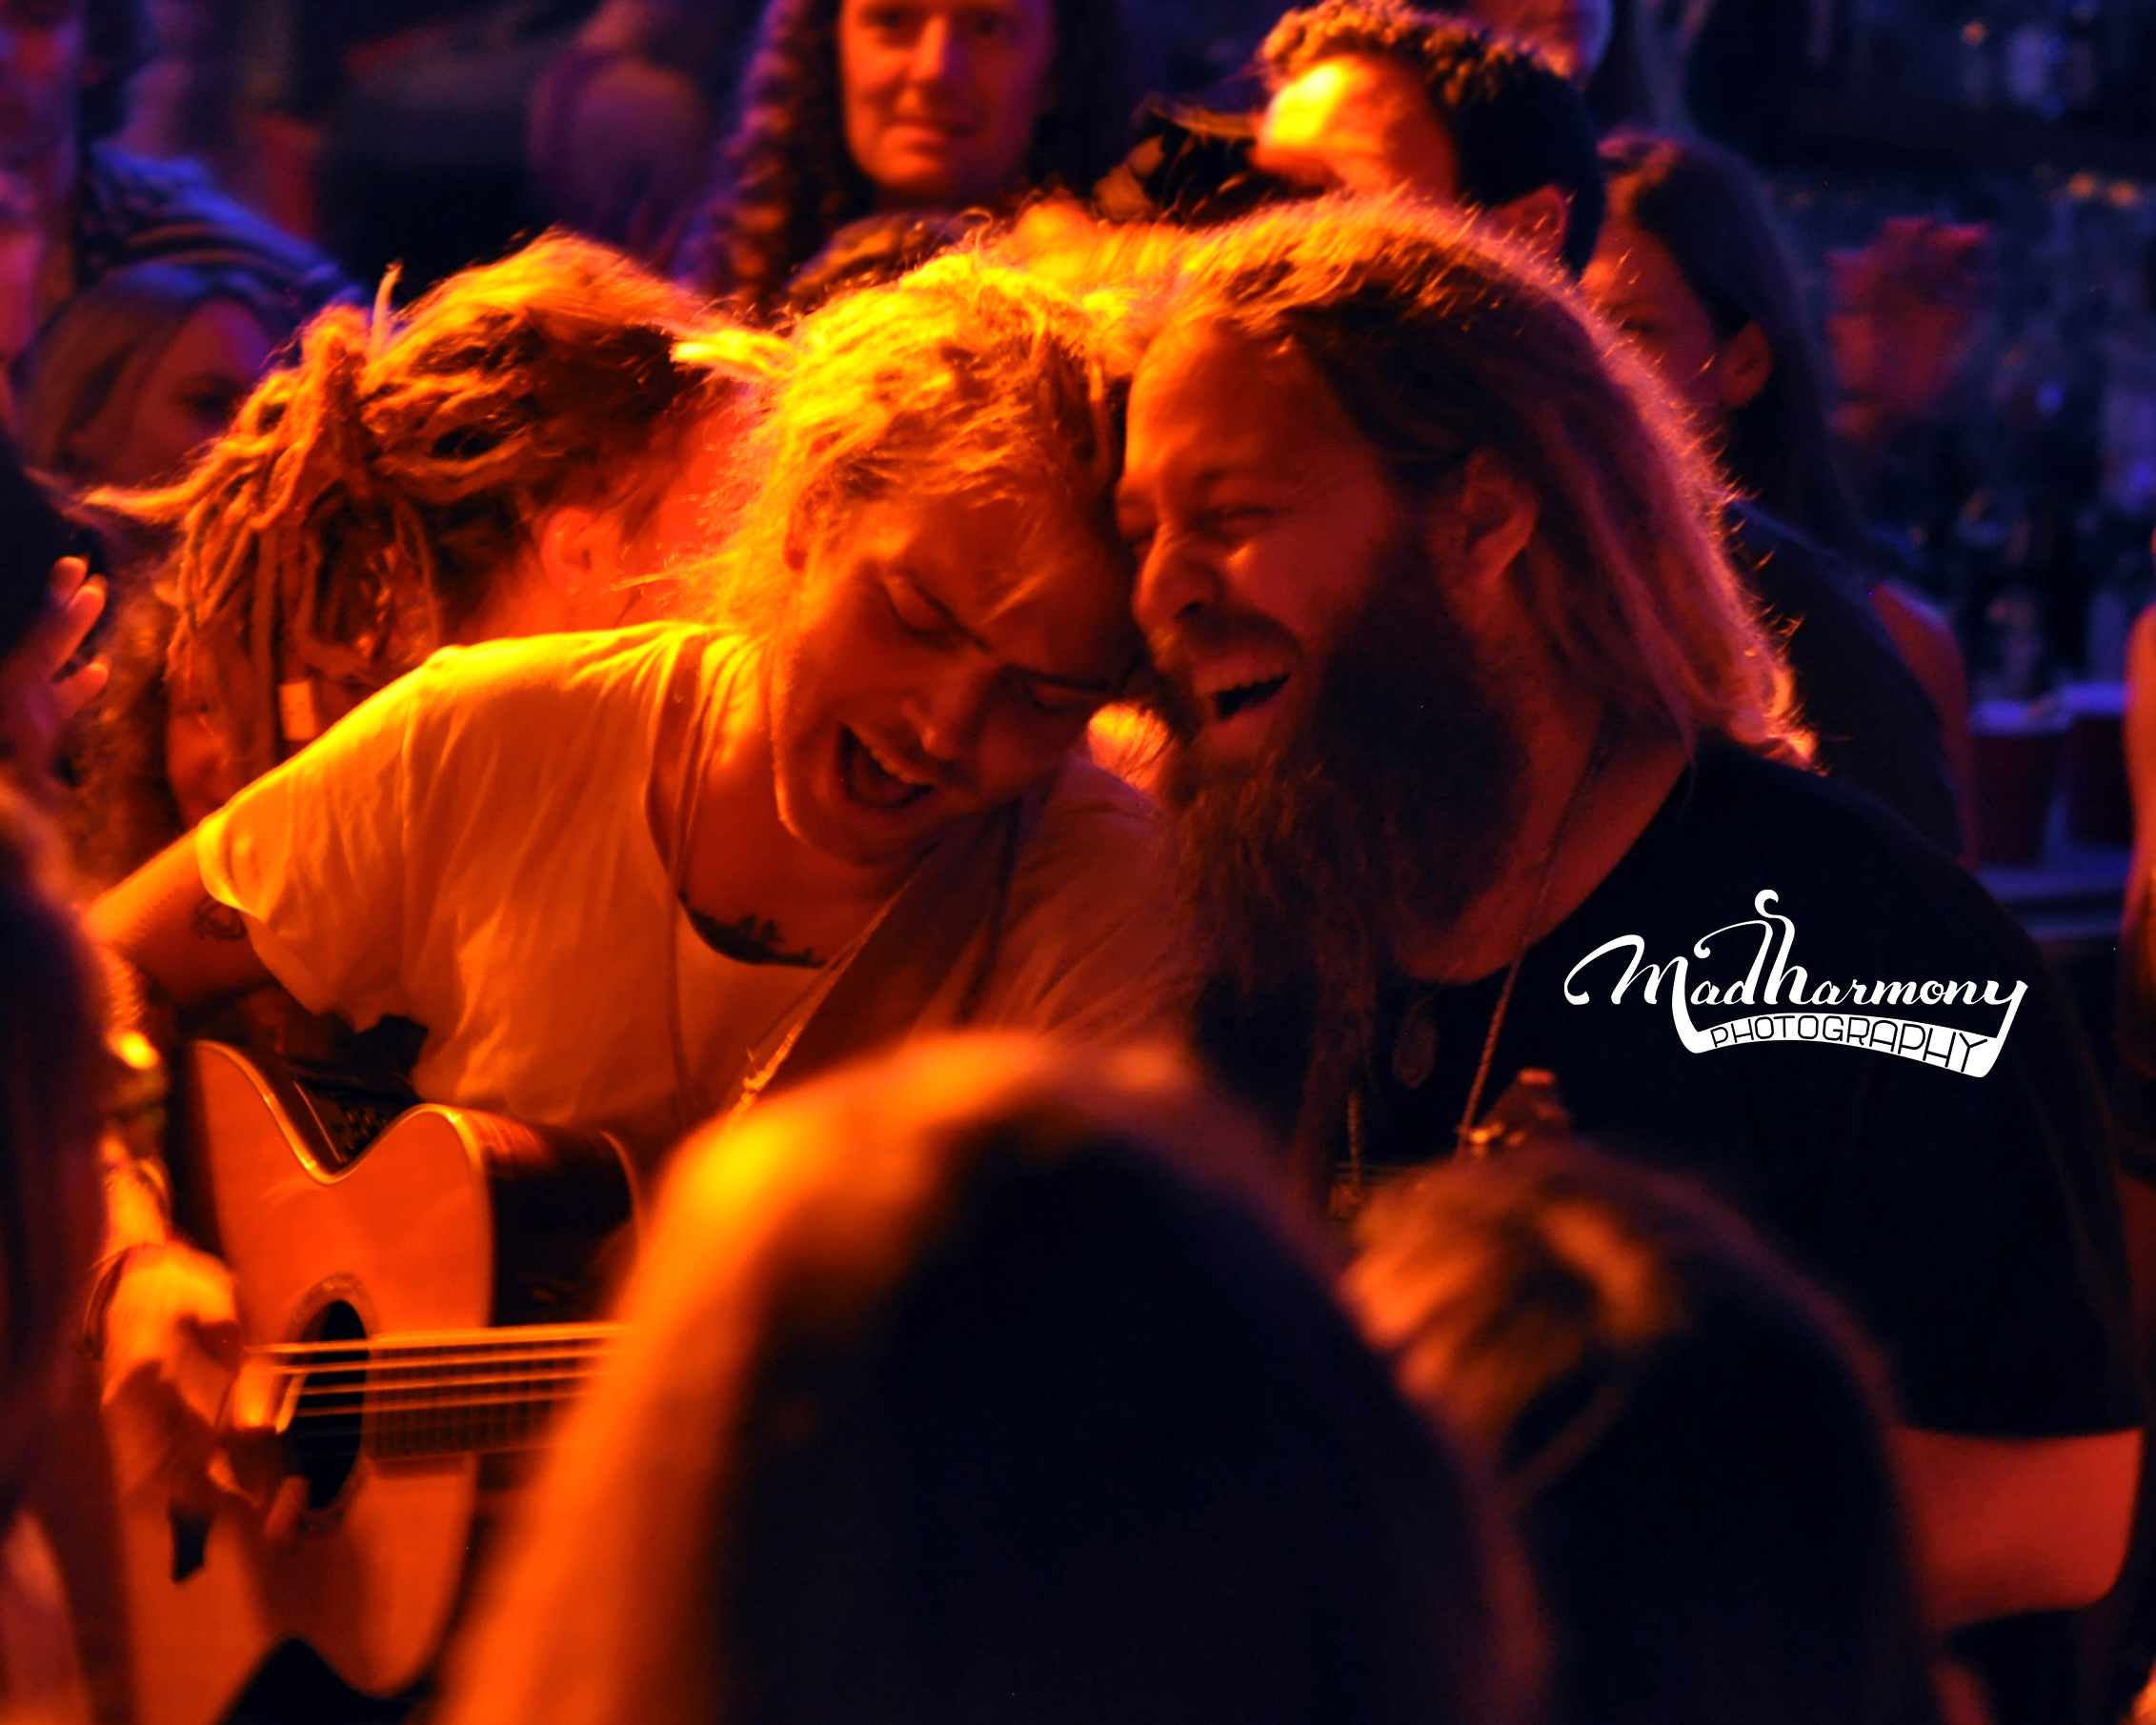 Trevor Hall & Mike Love encore in audience / 09.26.14 / Moe's Alley